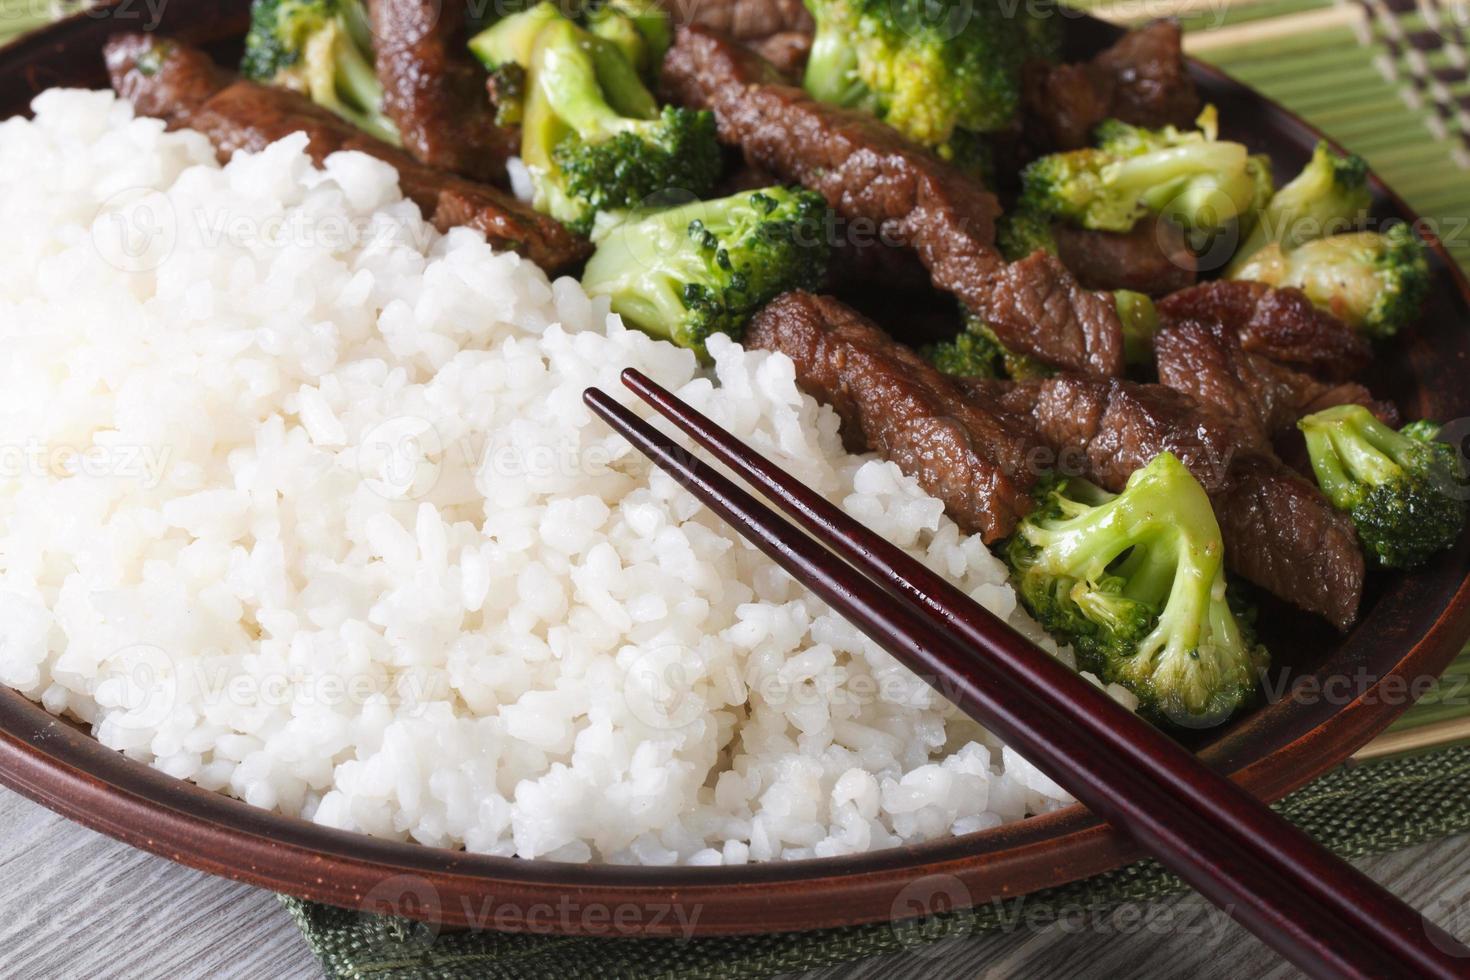 boeuf asiatique avec brocoli et macro de riz. horizontal photo